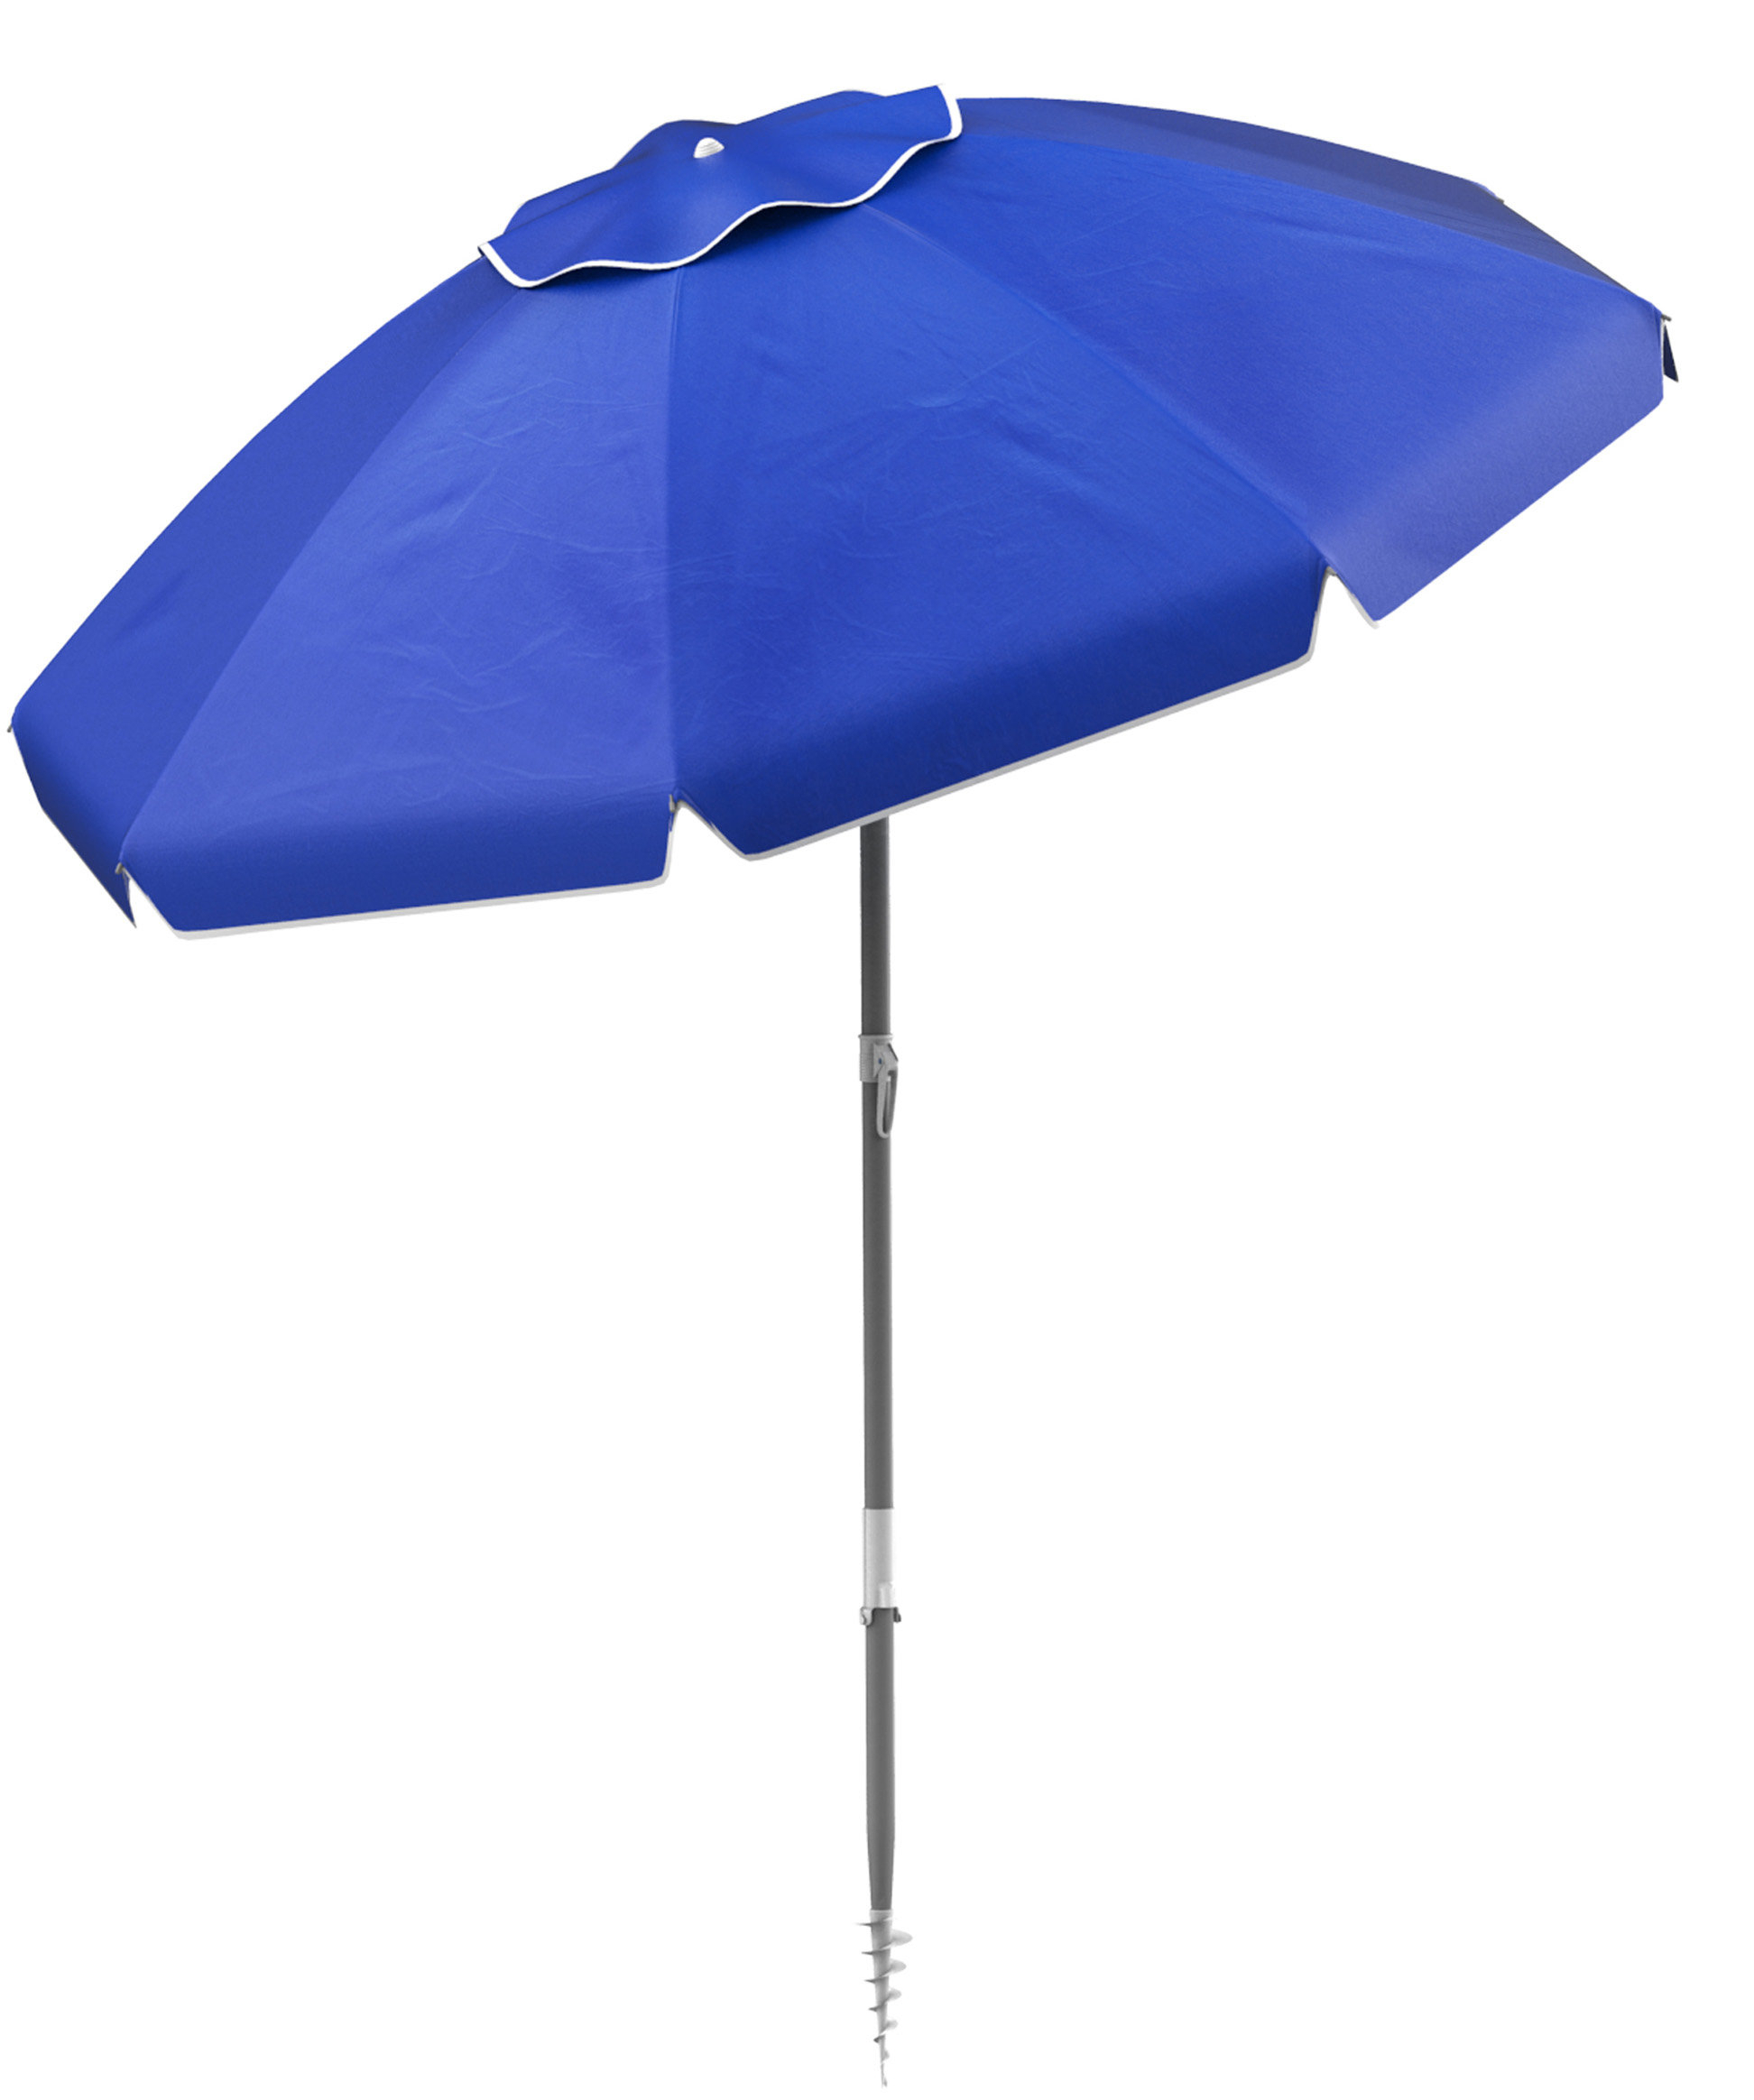 Best And Newest Alyson Joeshade Beach Umbrellas Within Stanhope Tilting Beach Umbrella (View 6 of 20)